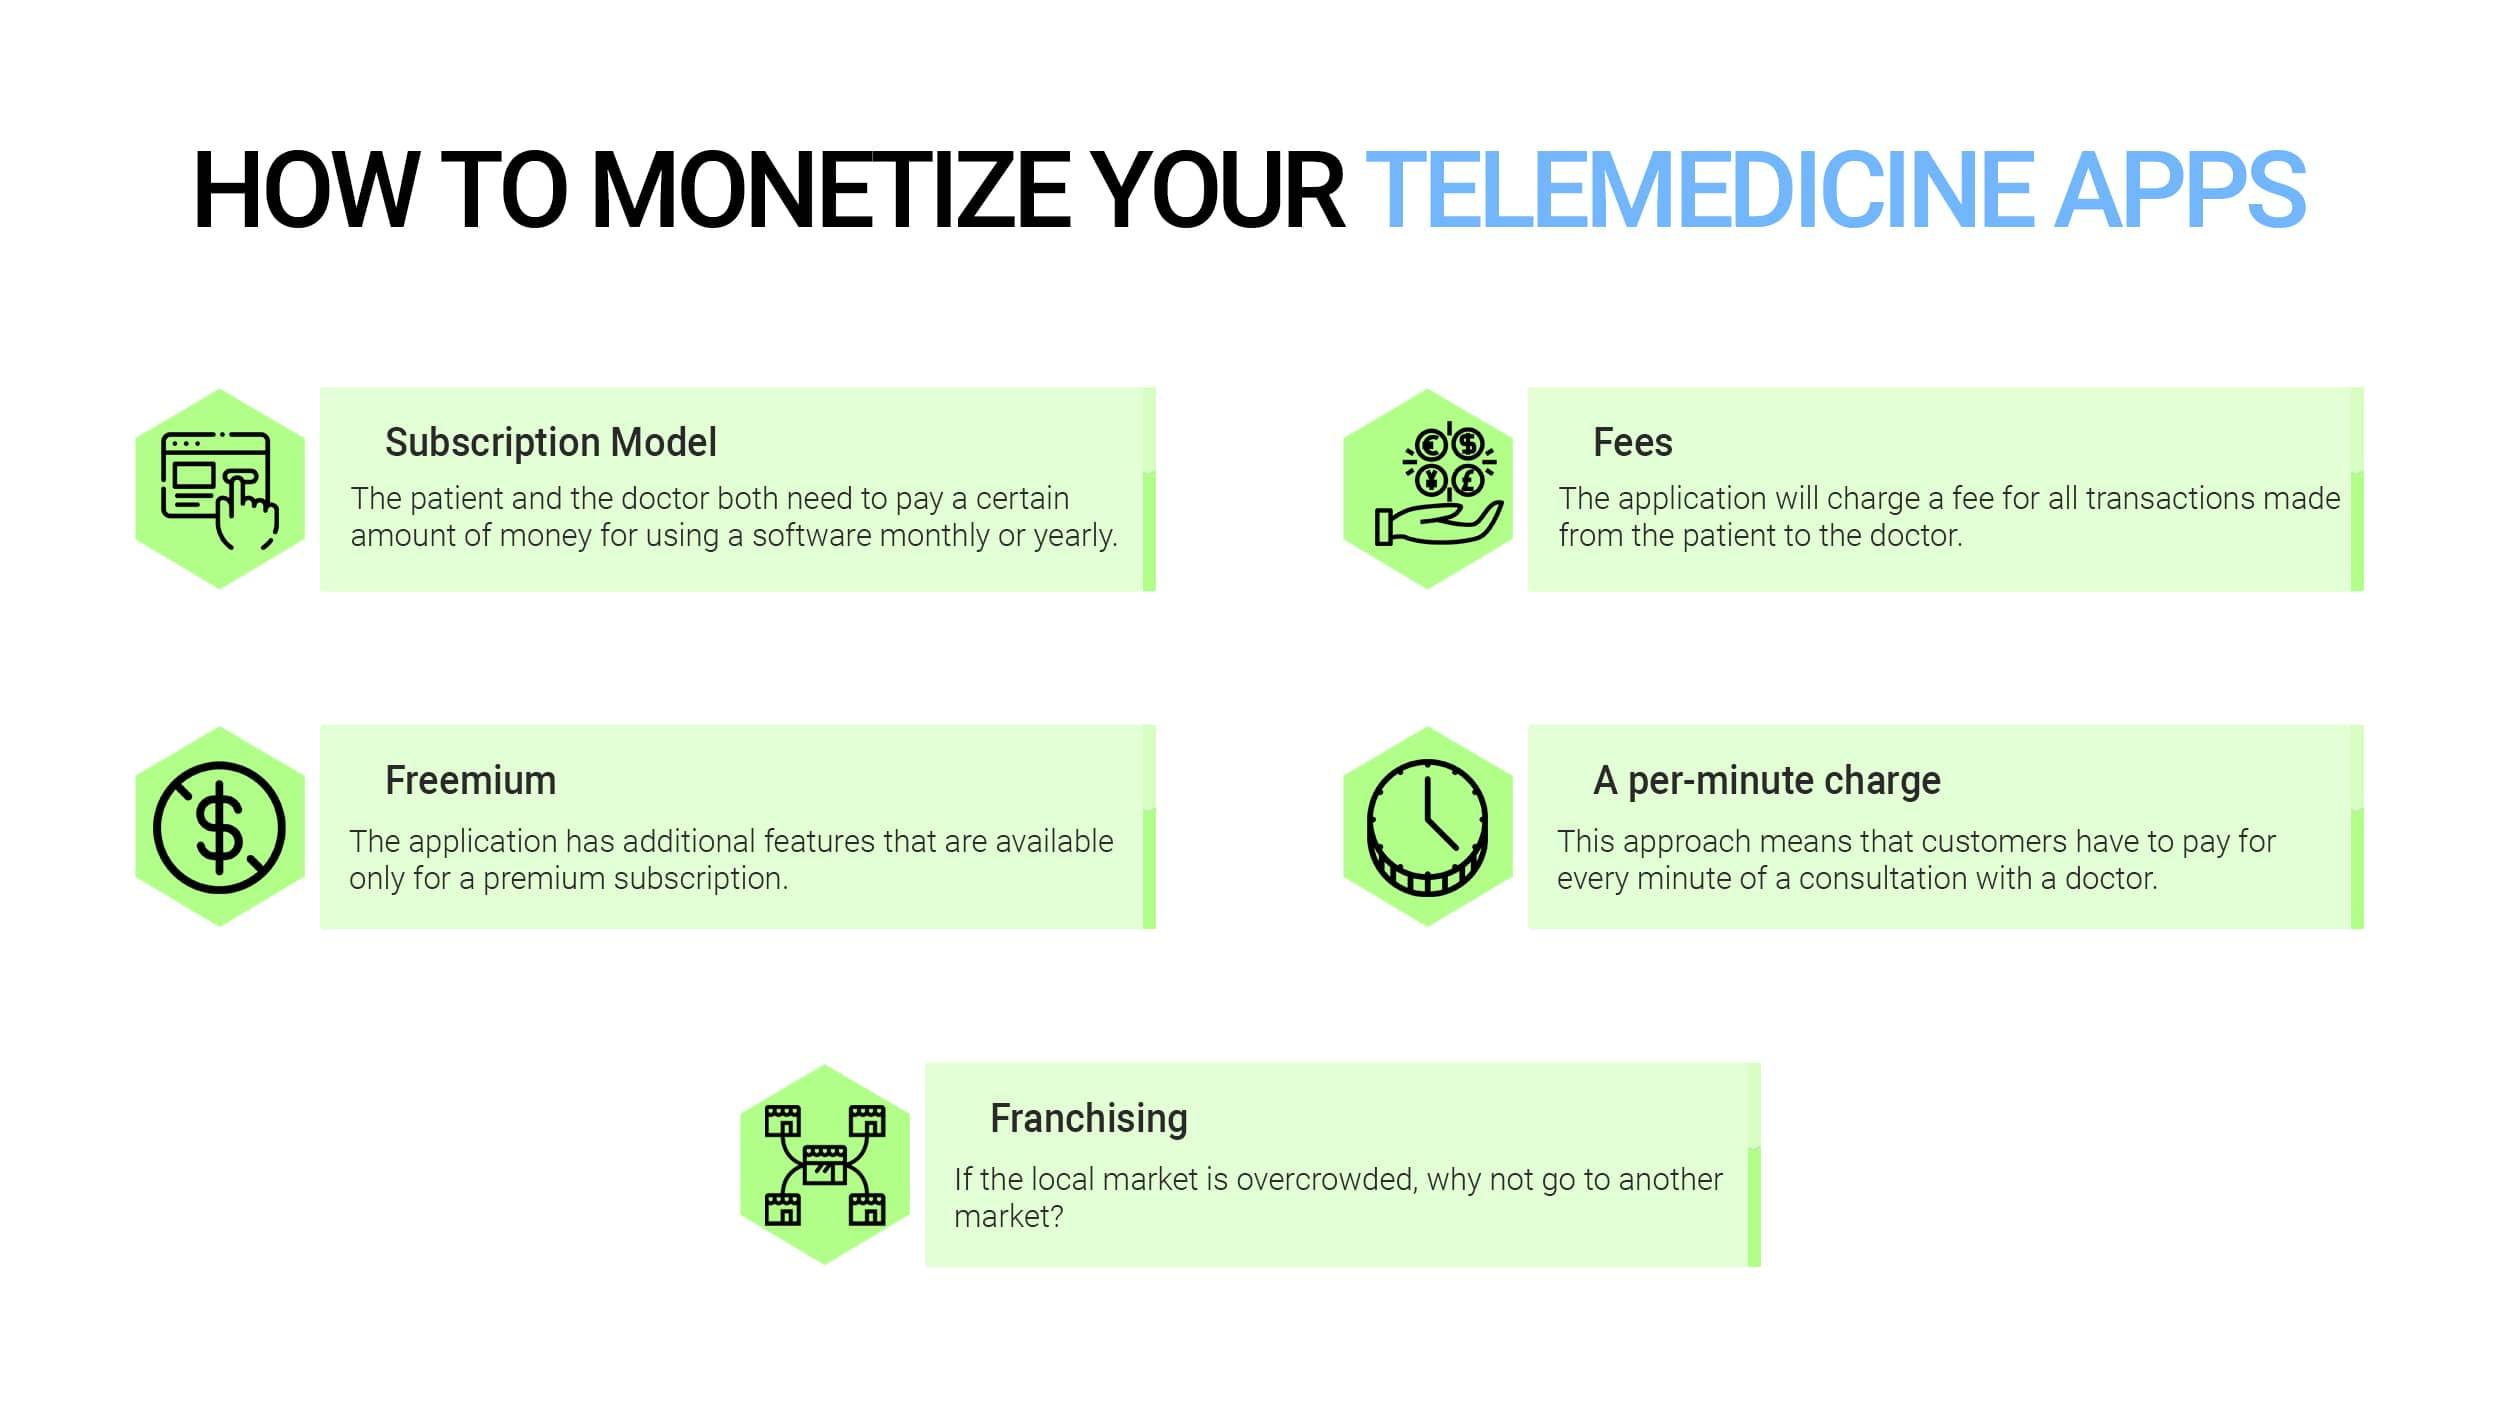 Monetization strategies for telemedicine apps